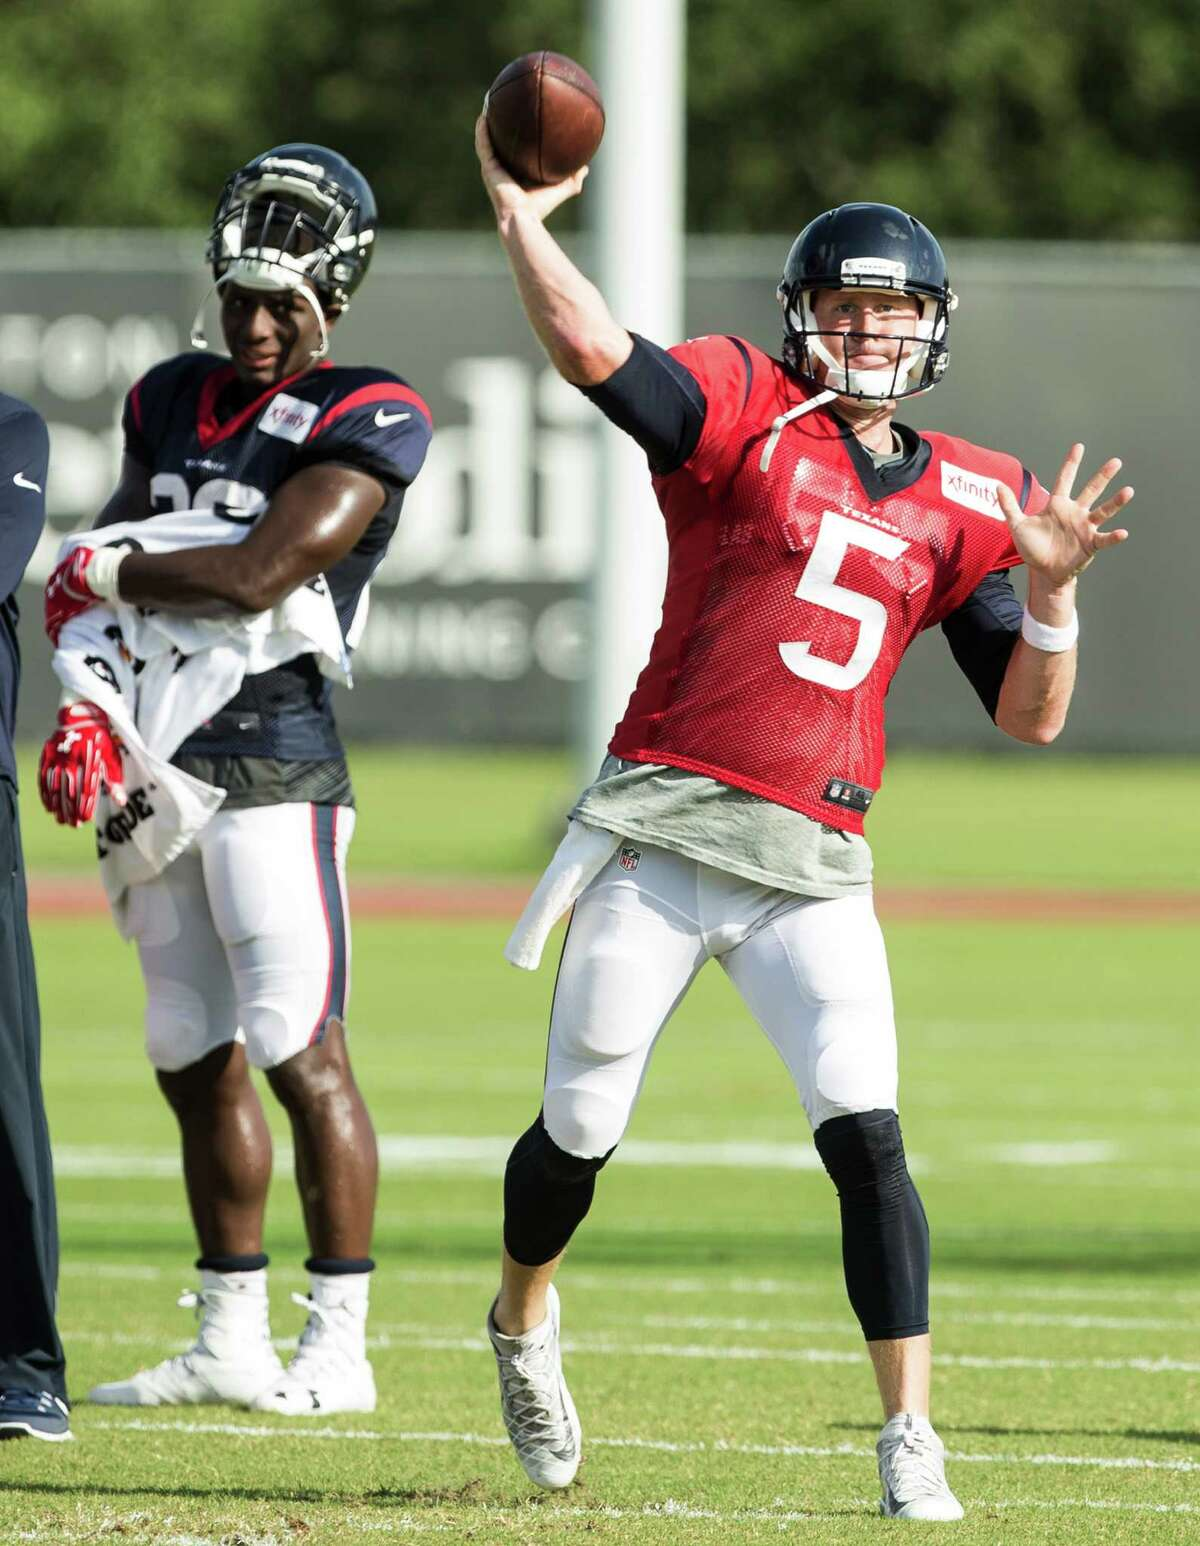 Houston Texans quarterback Brandon Weeden (5) throws a pass during Texans training camp at Houston Methodist Training Center on Saturday, Aug. 6, 2016, in Houston.